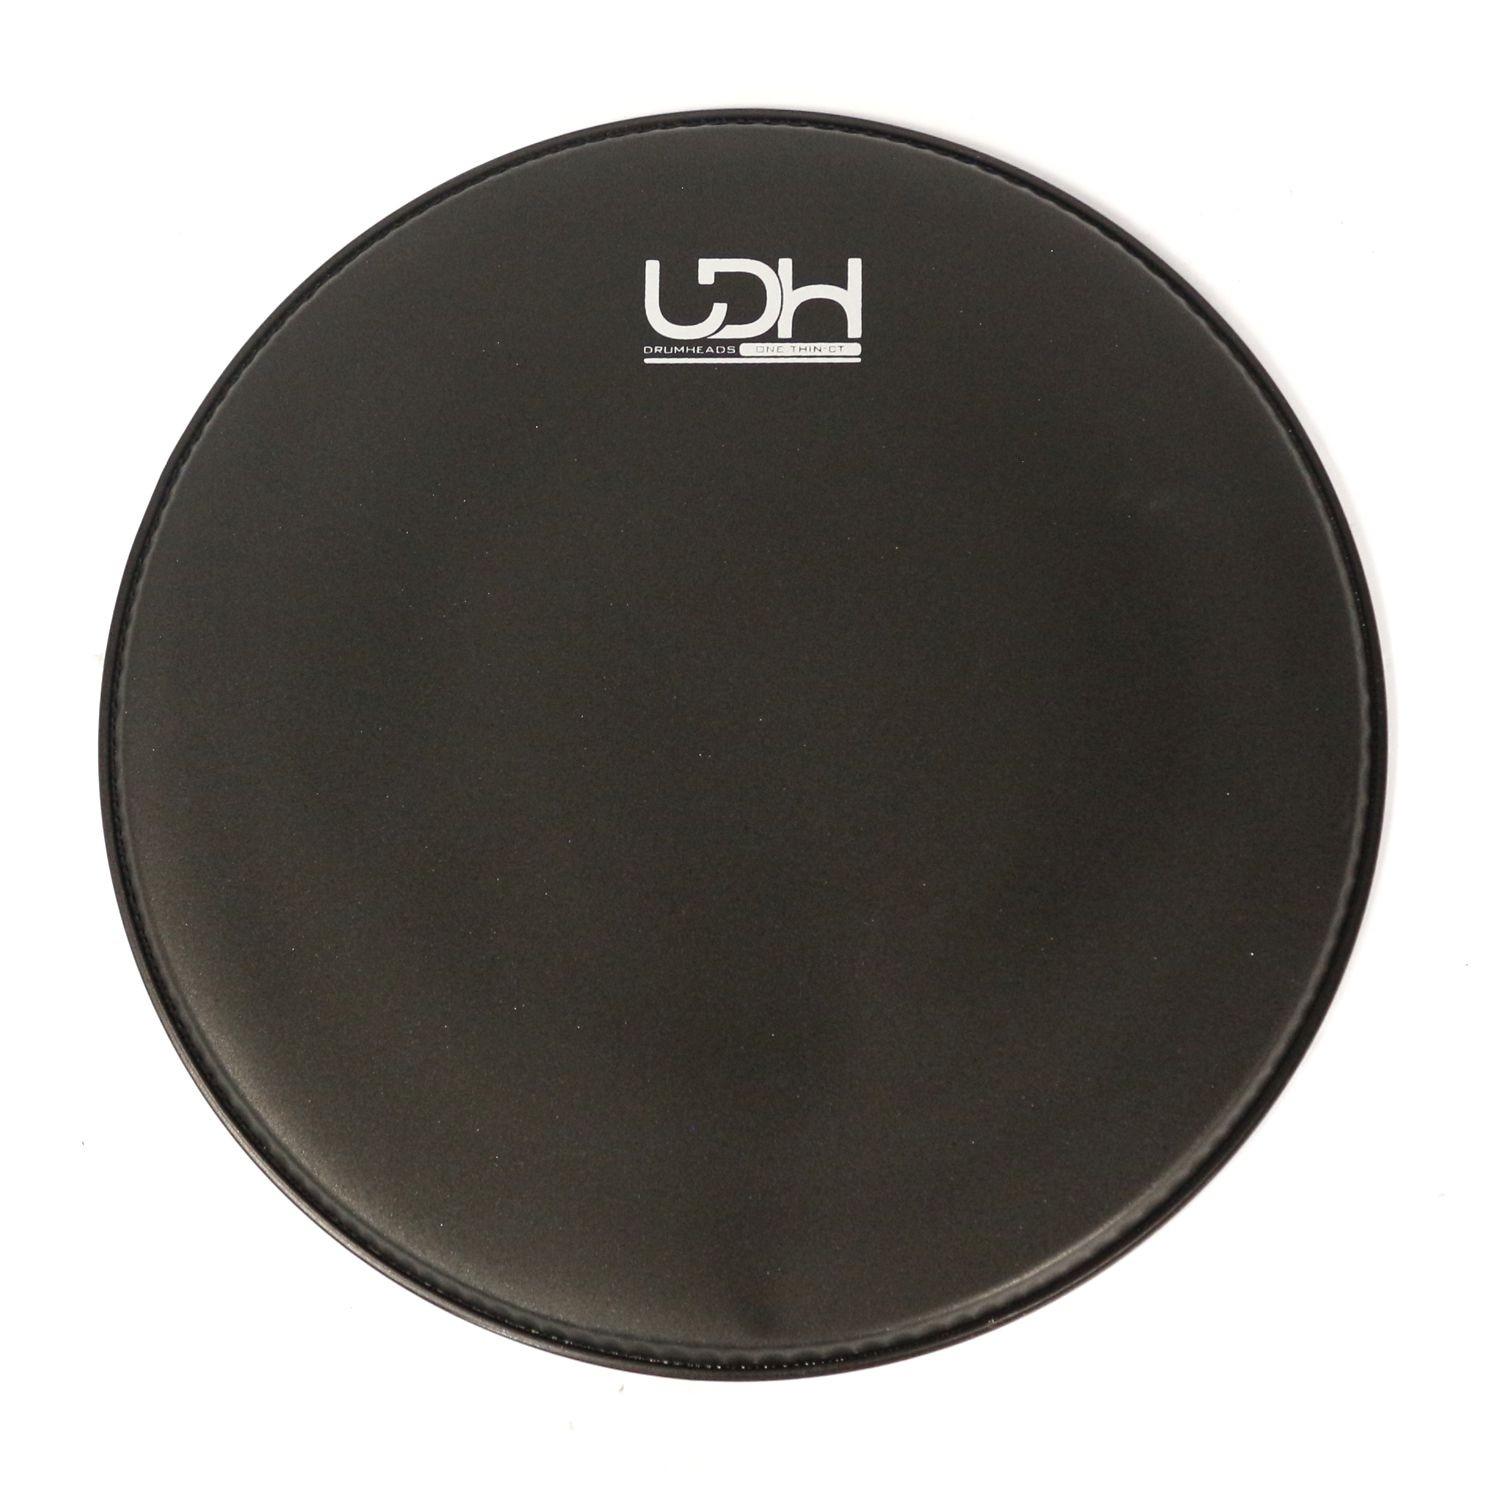 Pele para Caixa 14´ ONE THIN Porosa Luen Drumhead - Preto